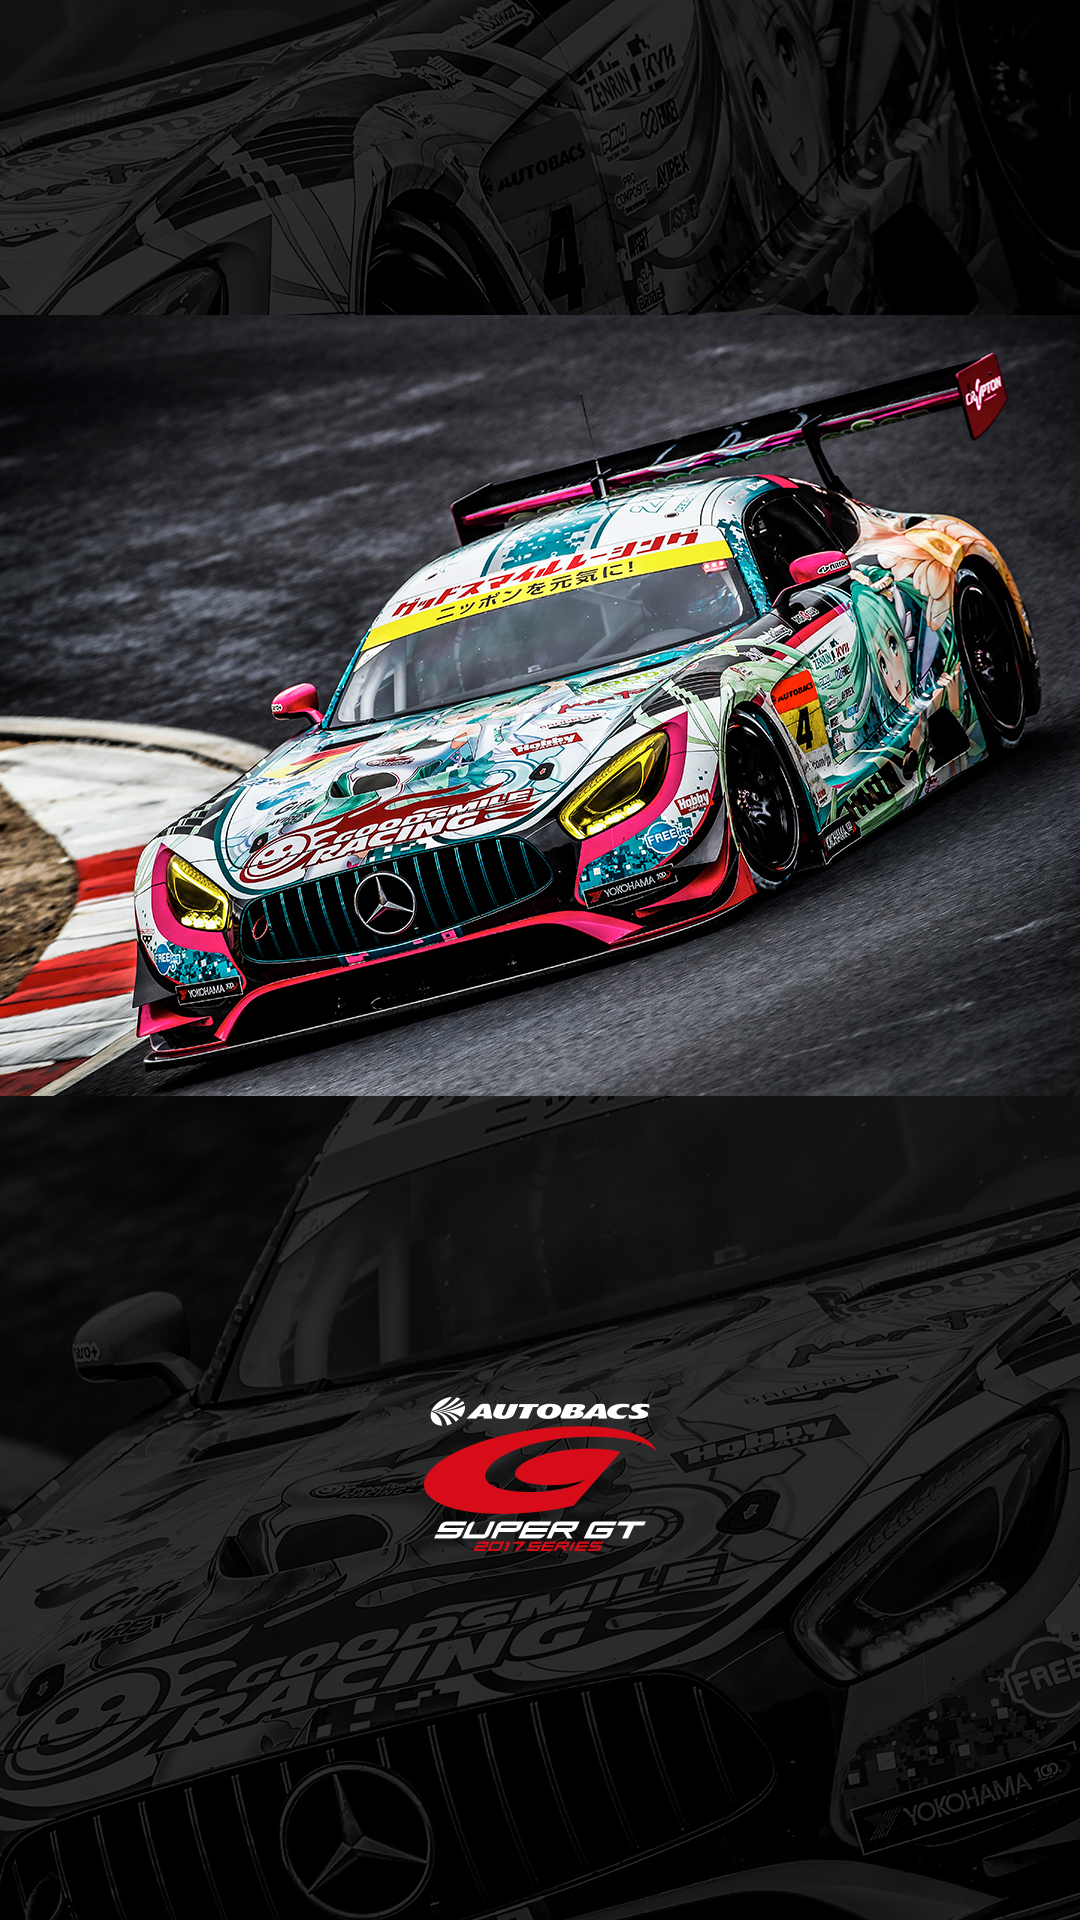 Wallpaper 開幕 Rd1 Okayama Super Gt Official Website